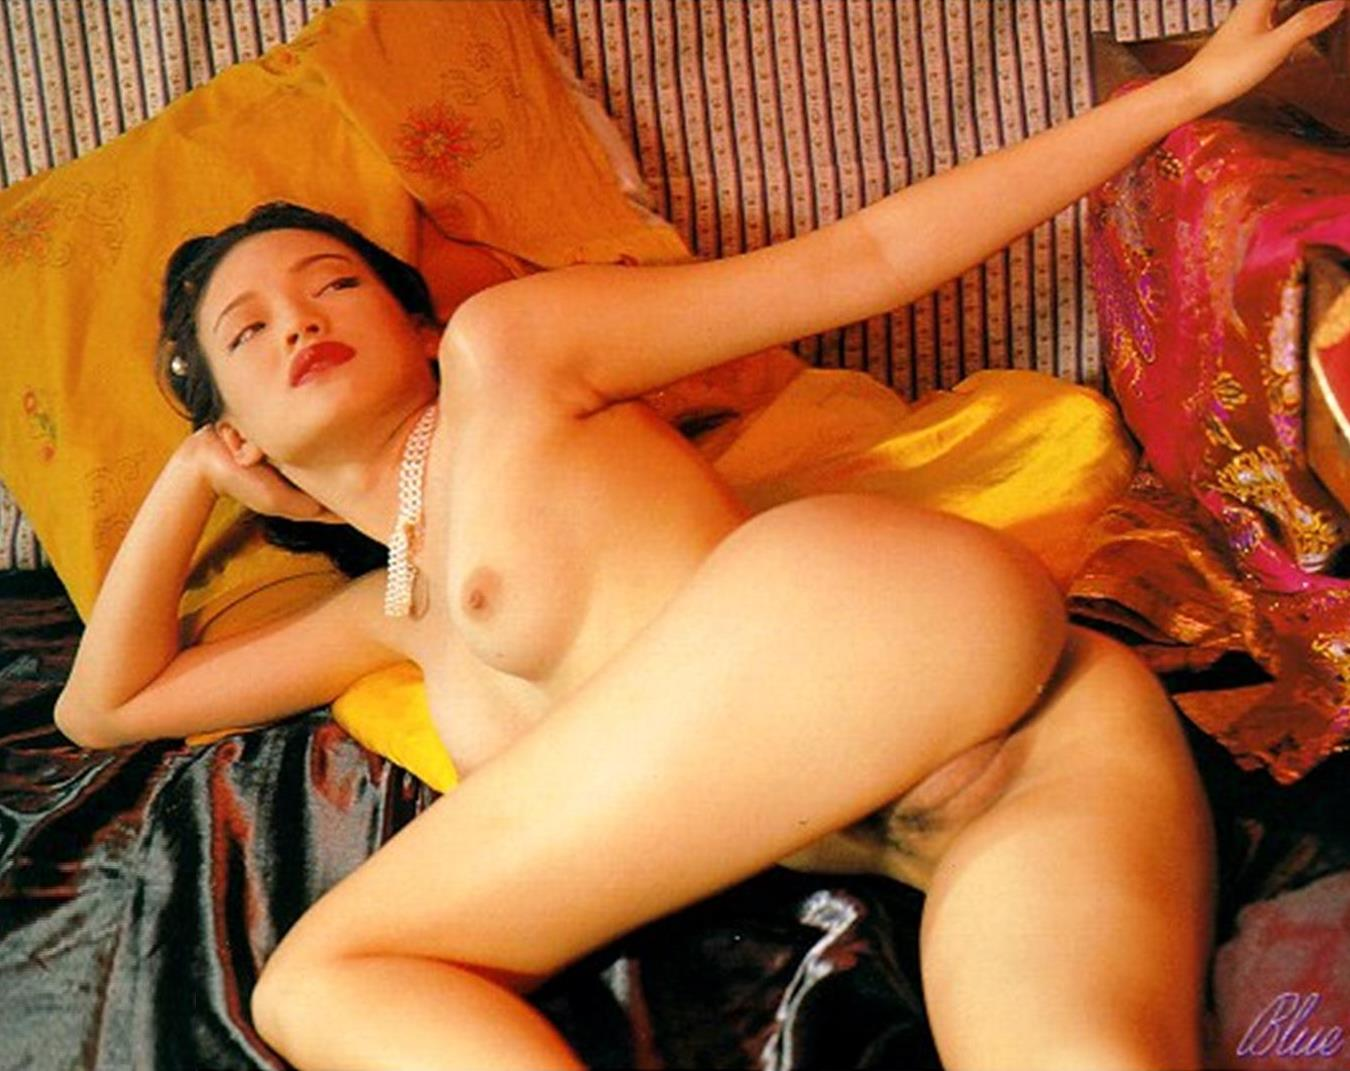 Sex porn boobs vaginas and dicks